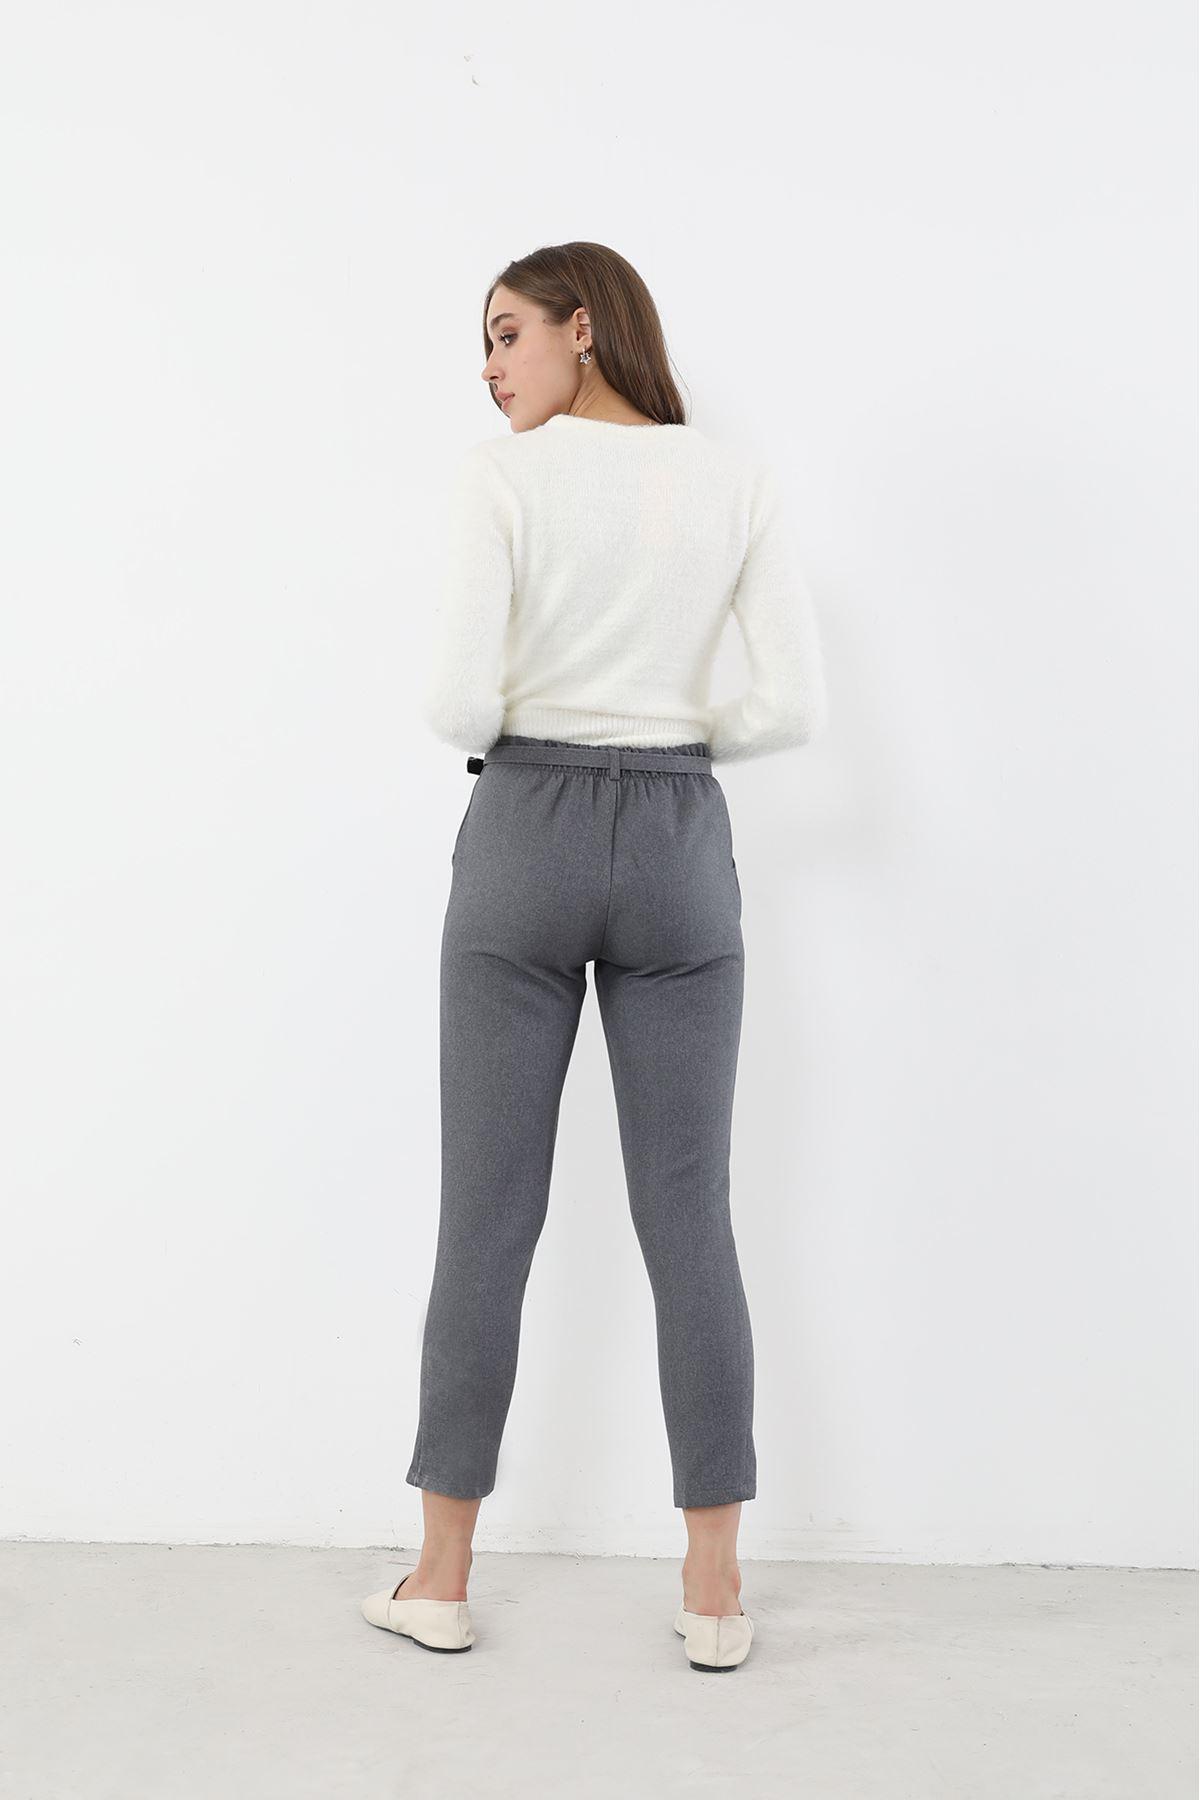 Beli Lastikli Yüksek Bel Pantolon-Füme